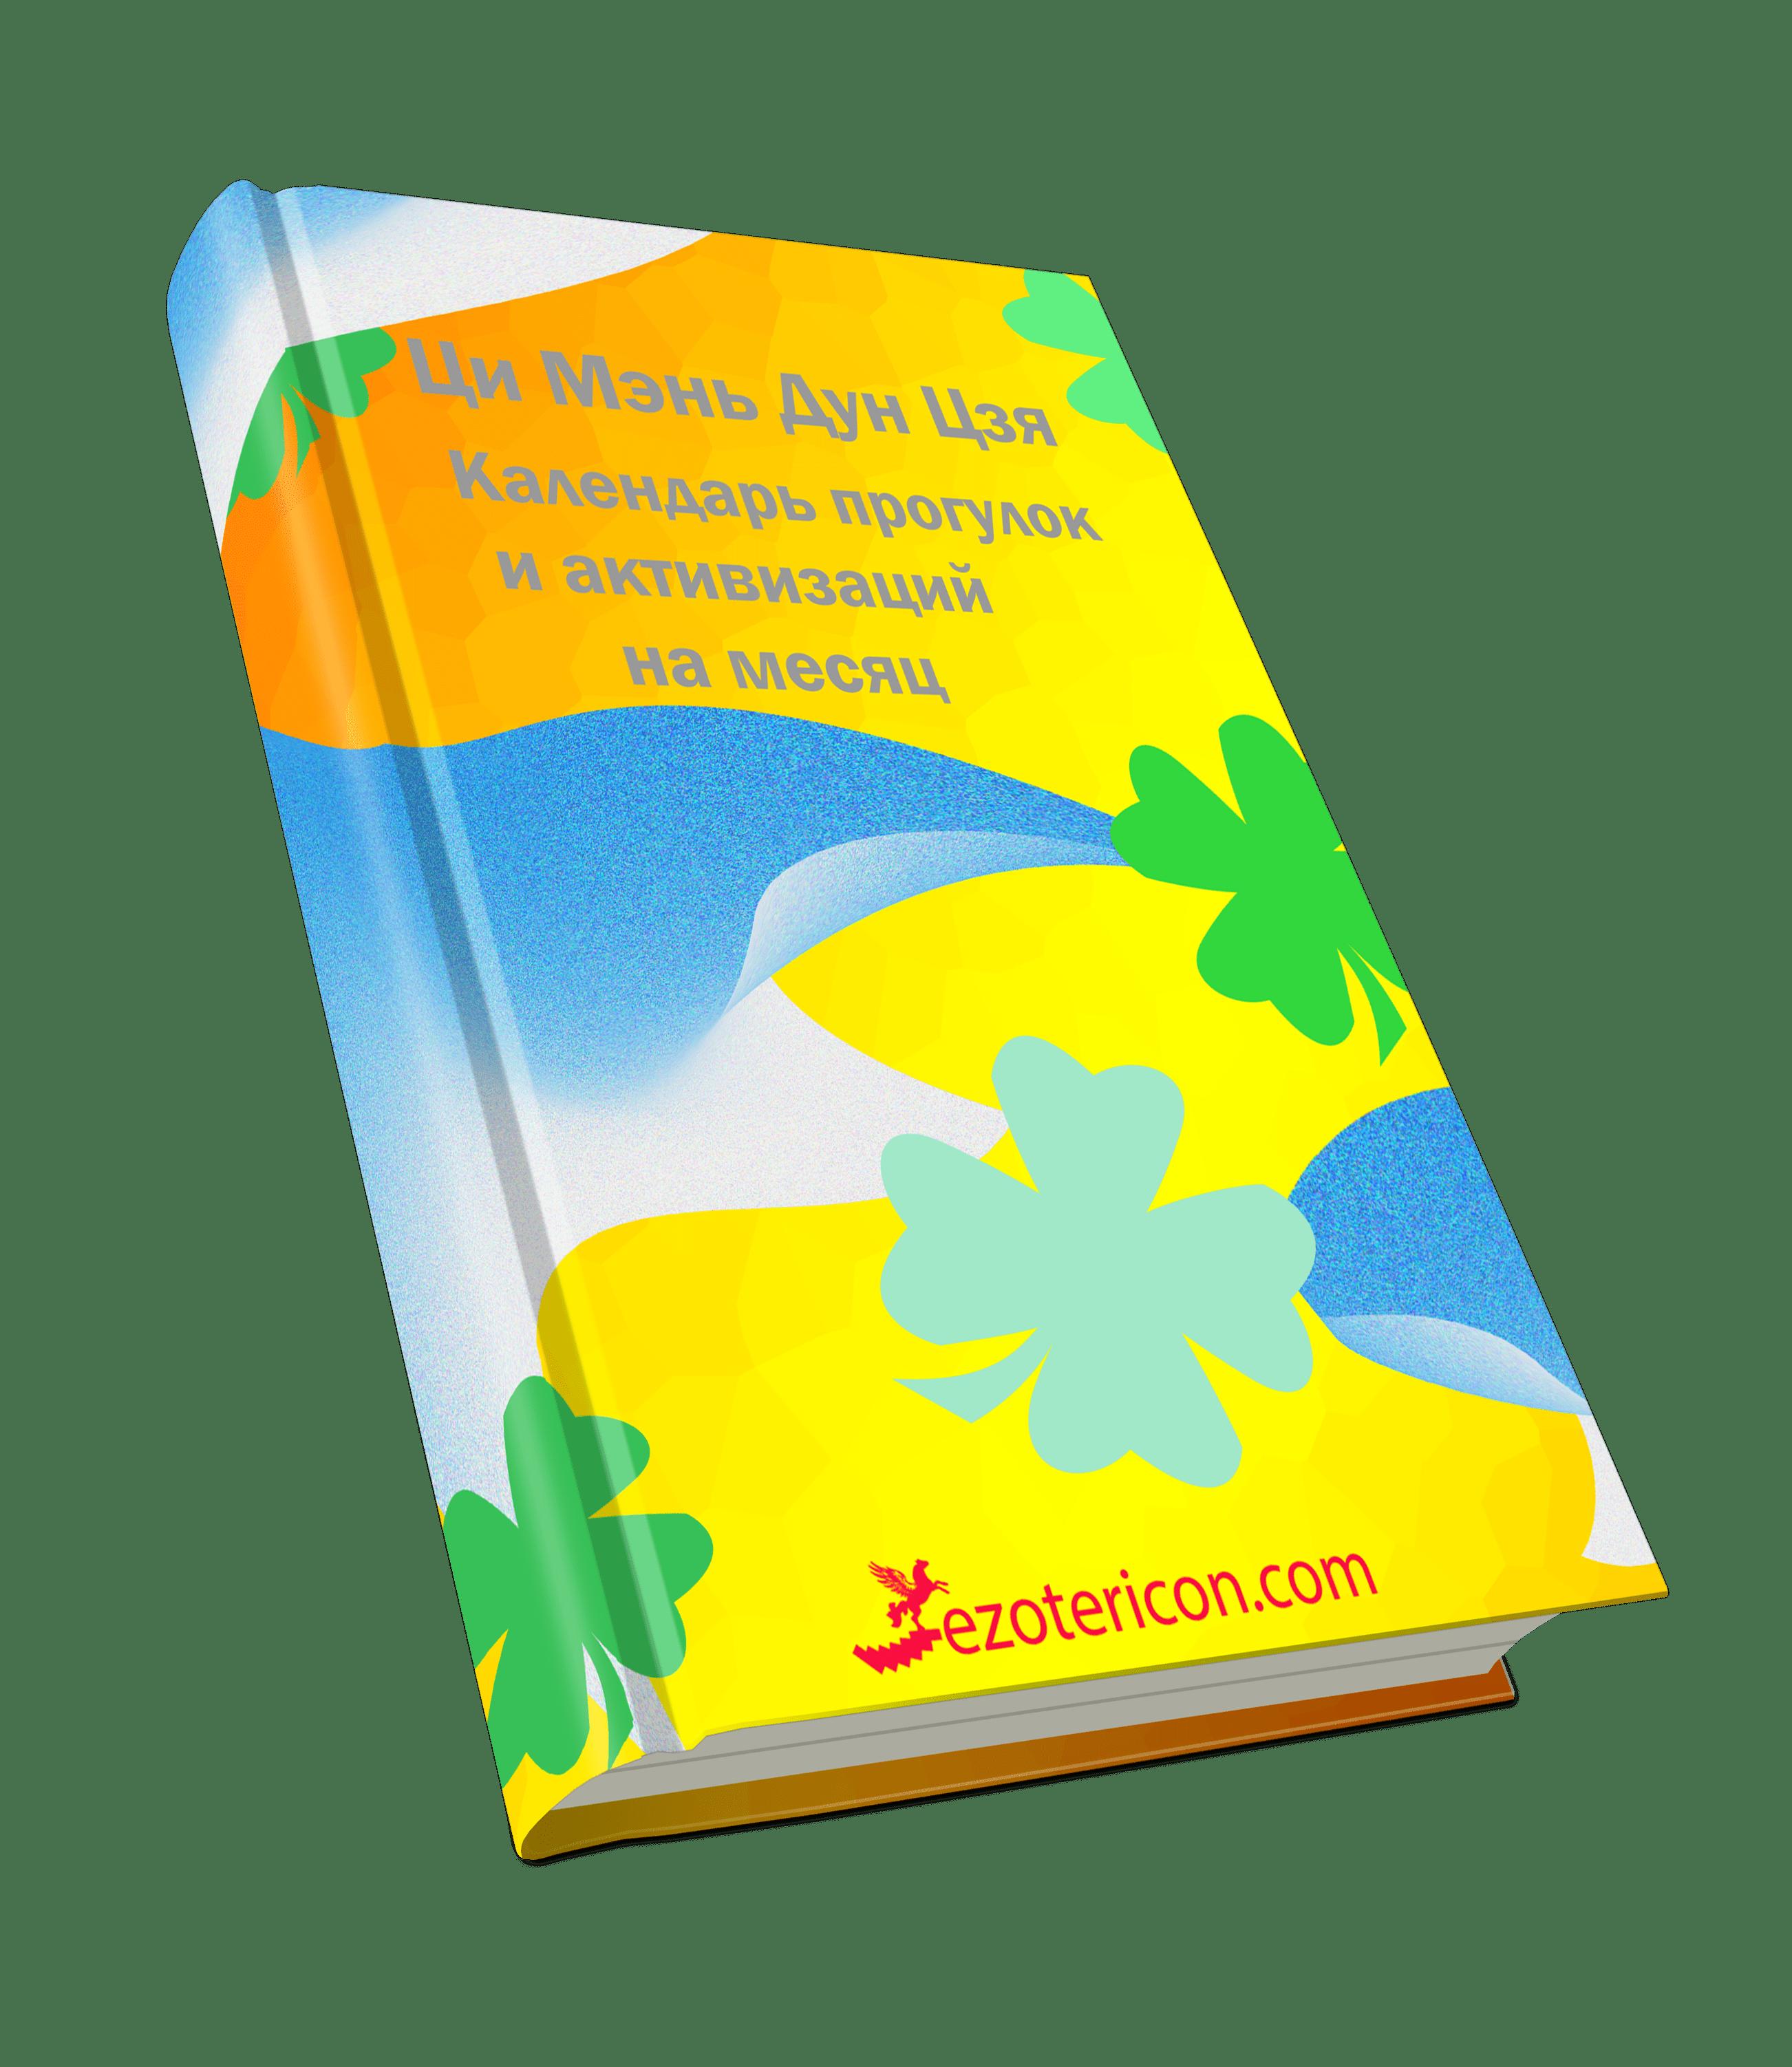 Календарь прогулок и активаций Ци Мень Дун Цзя на 2019 год